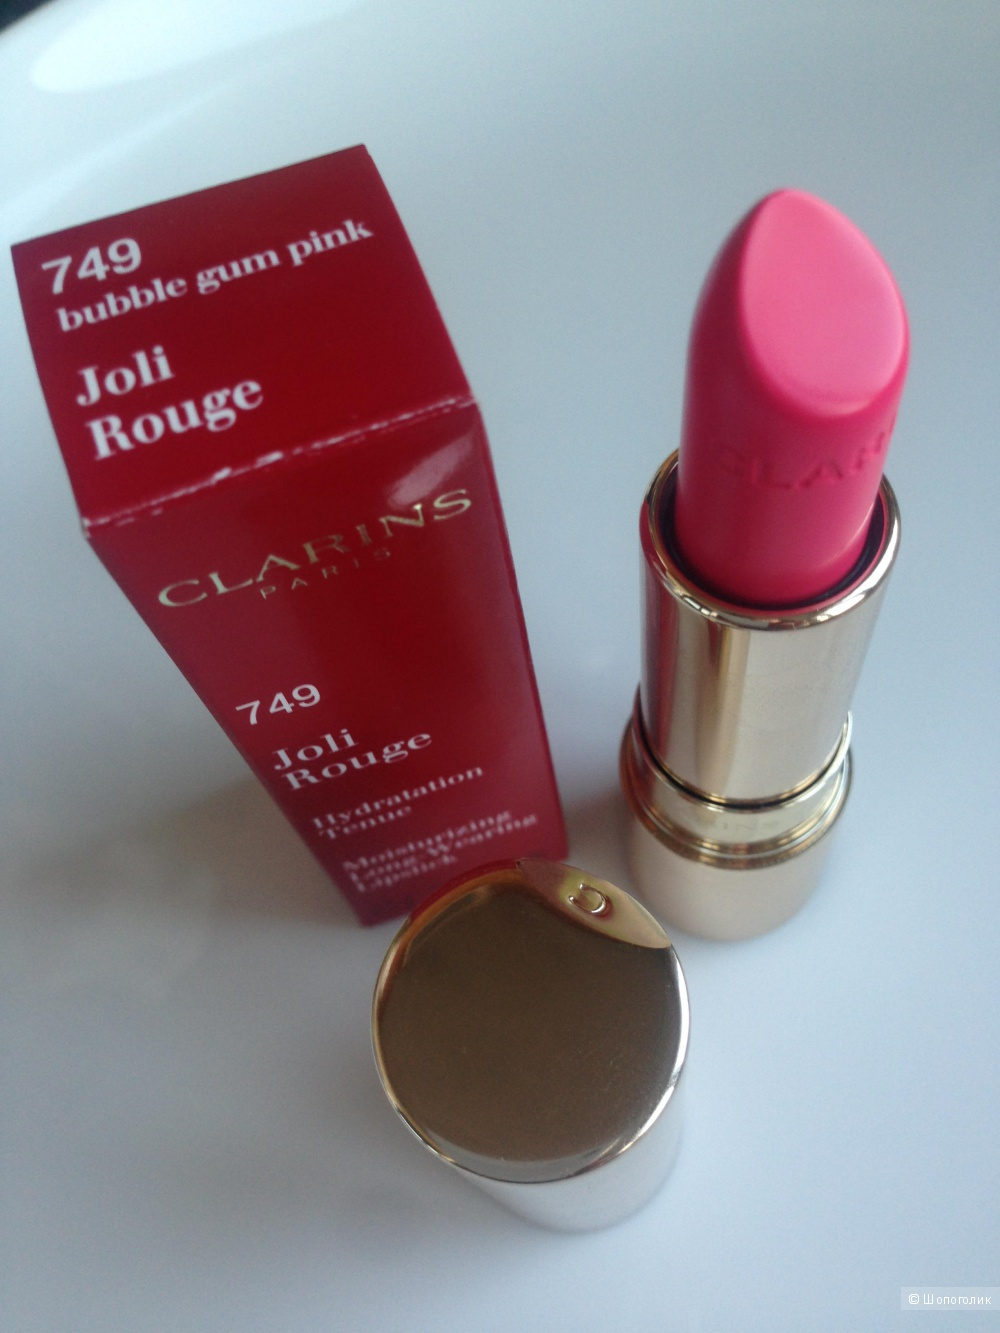 Помада Clarins Joli Rouge 749 Bubble gum pink